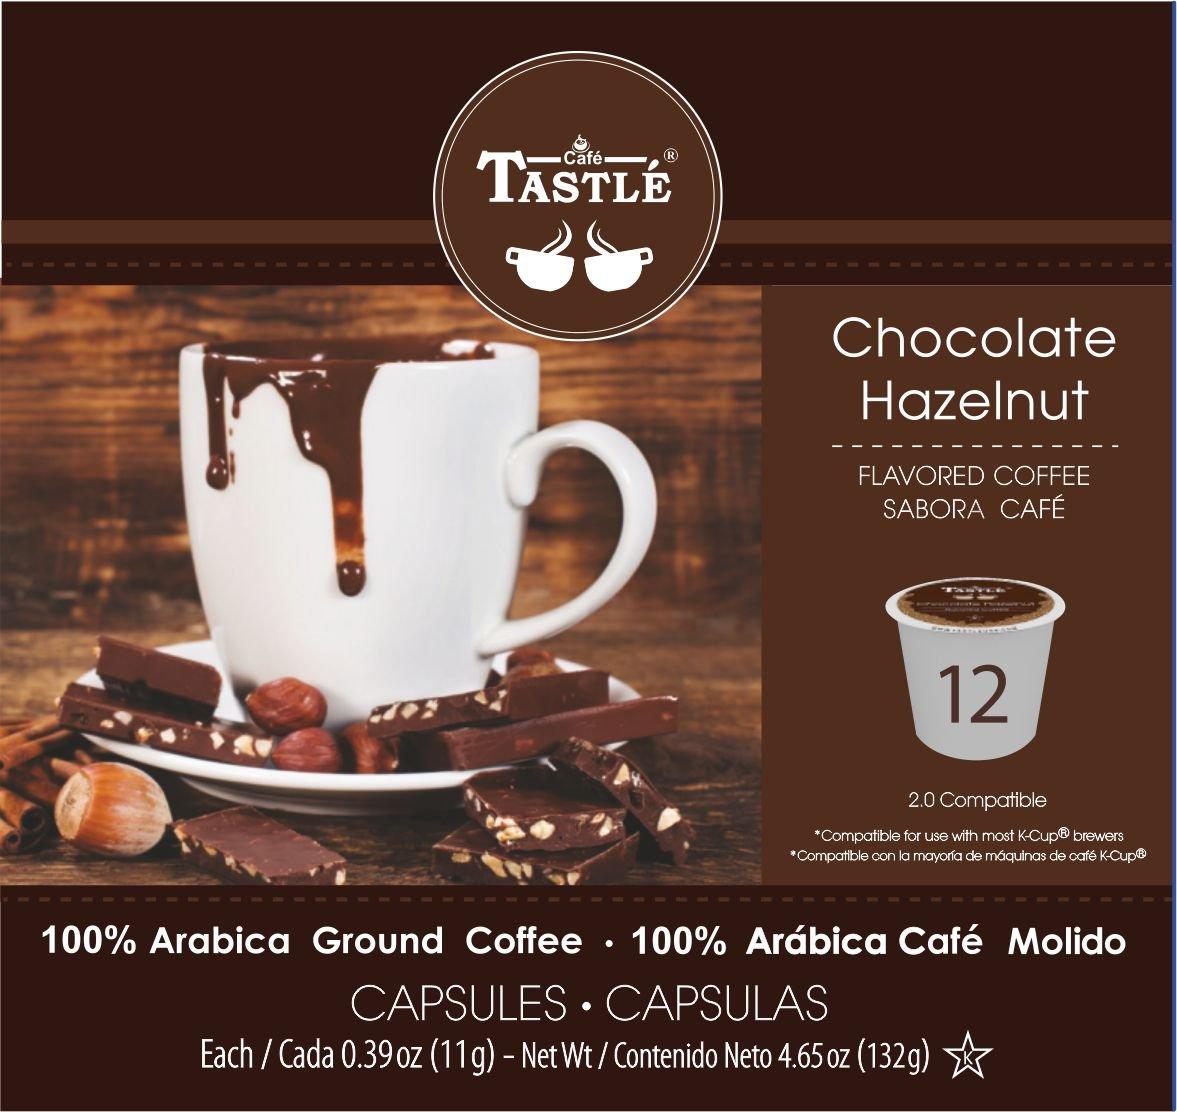 Amazon.com : Cafe Tastlé Chocolate Hazelnut Single Serve Coffee, 24 Count : Grocery & Gourmet Food